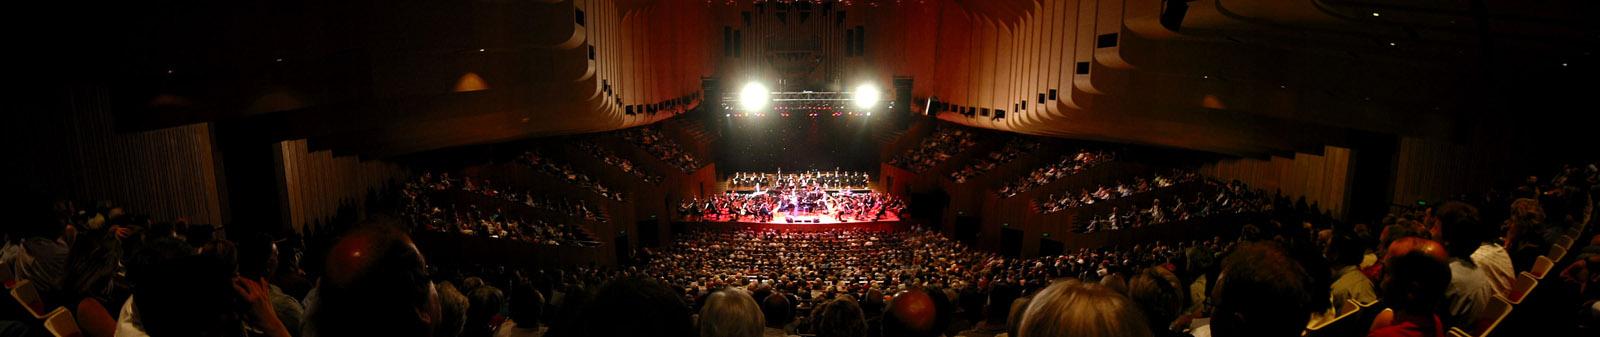 Sydney Opera House Seating Sydney Opera House Interior